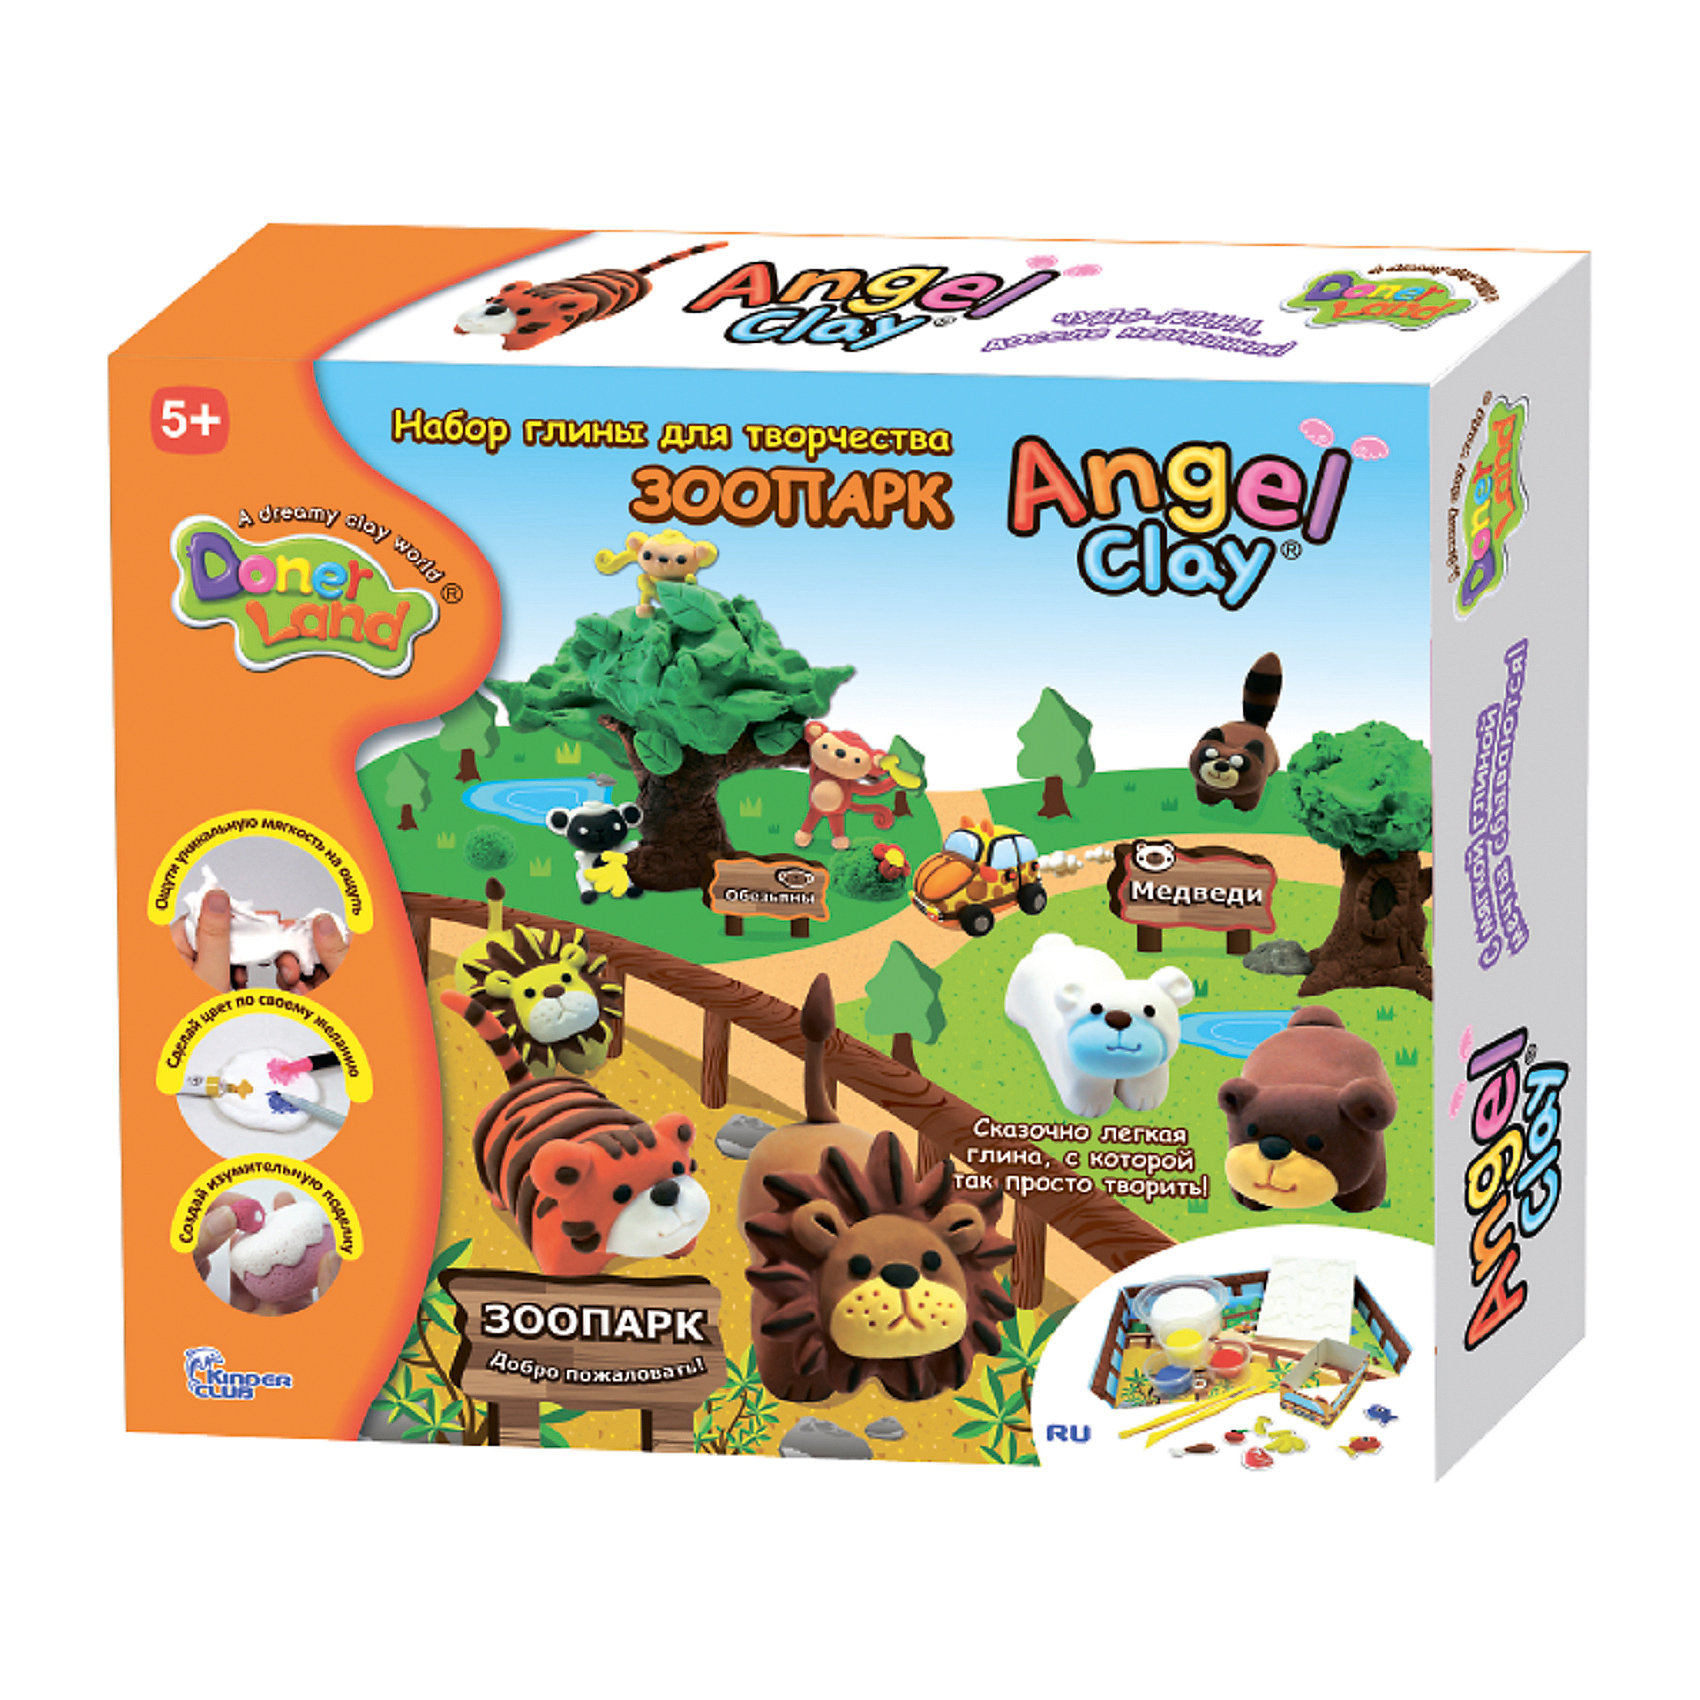 Angel Clay Игровой набор для лепки из глины Animal Park, Angel Clay набор для лепки donerland angel clay funny safari aa14021